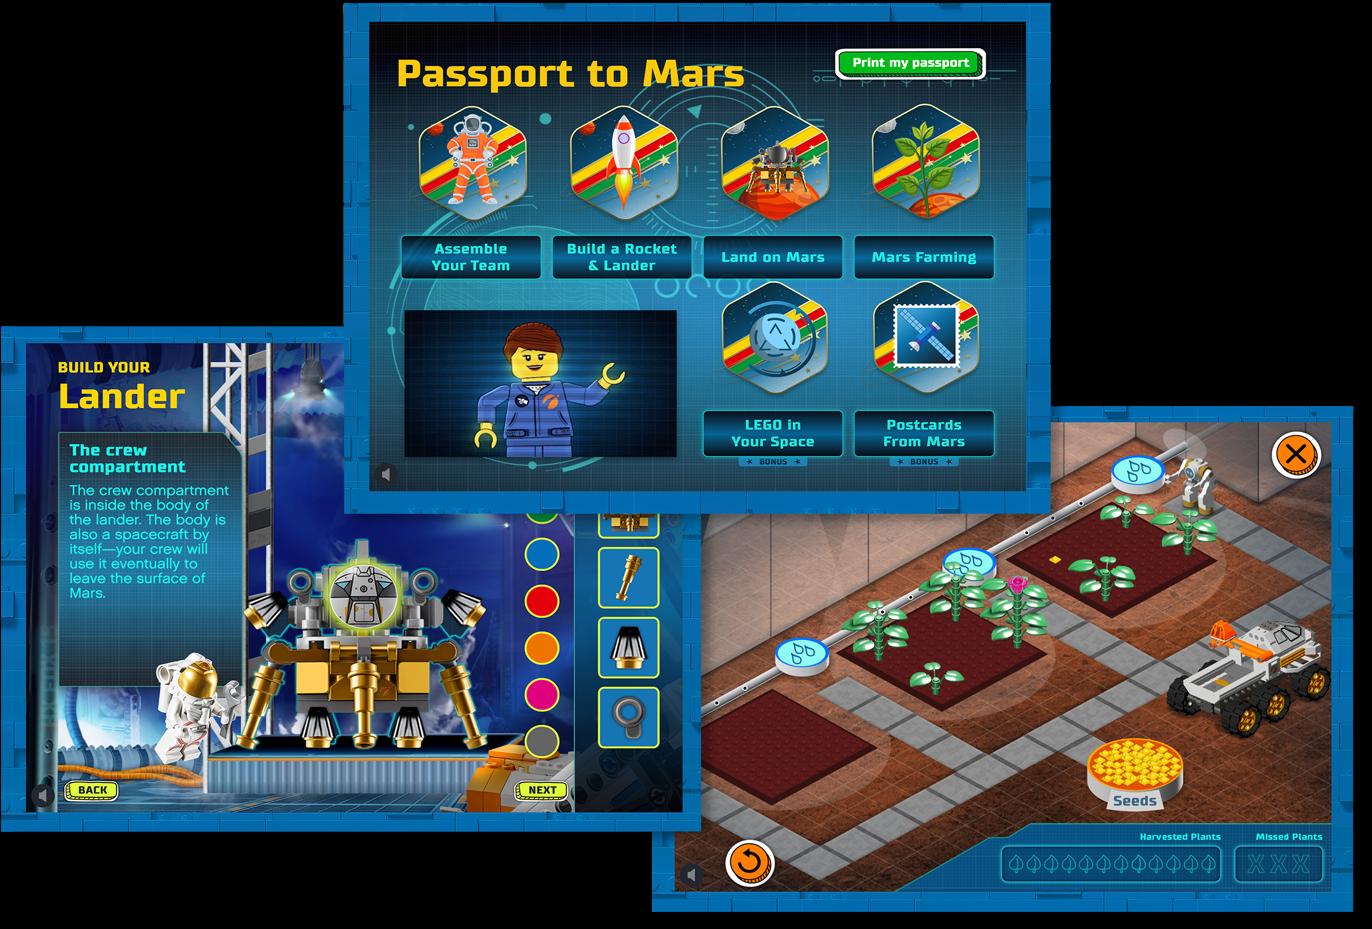 LEGO-screens